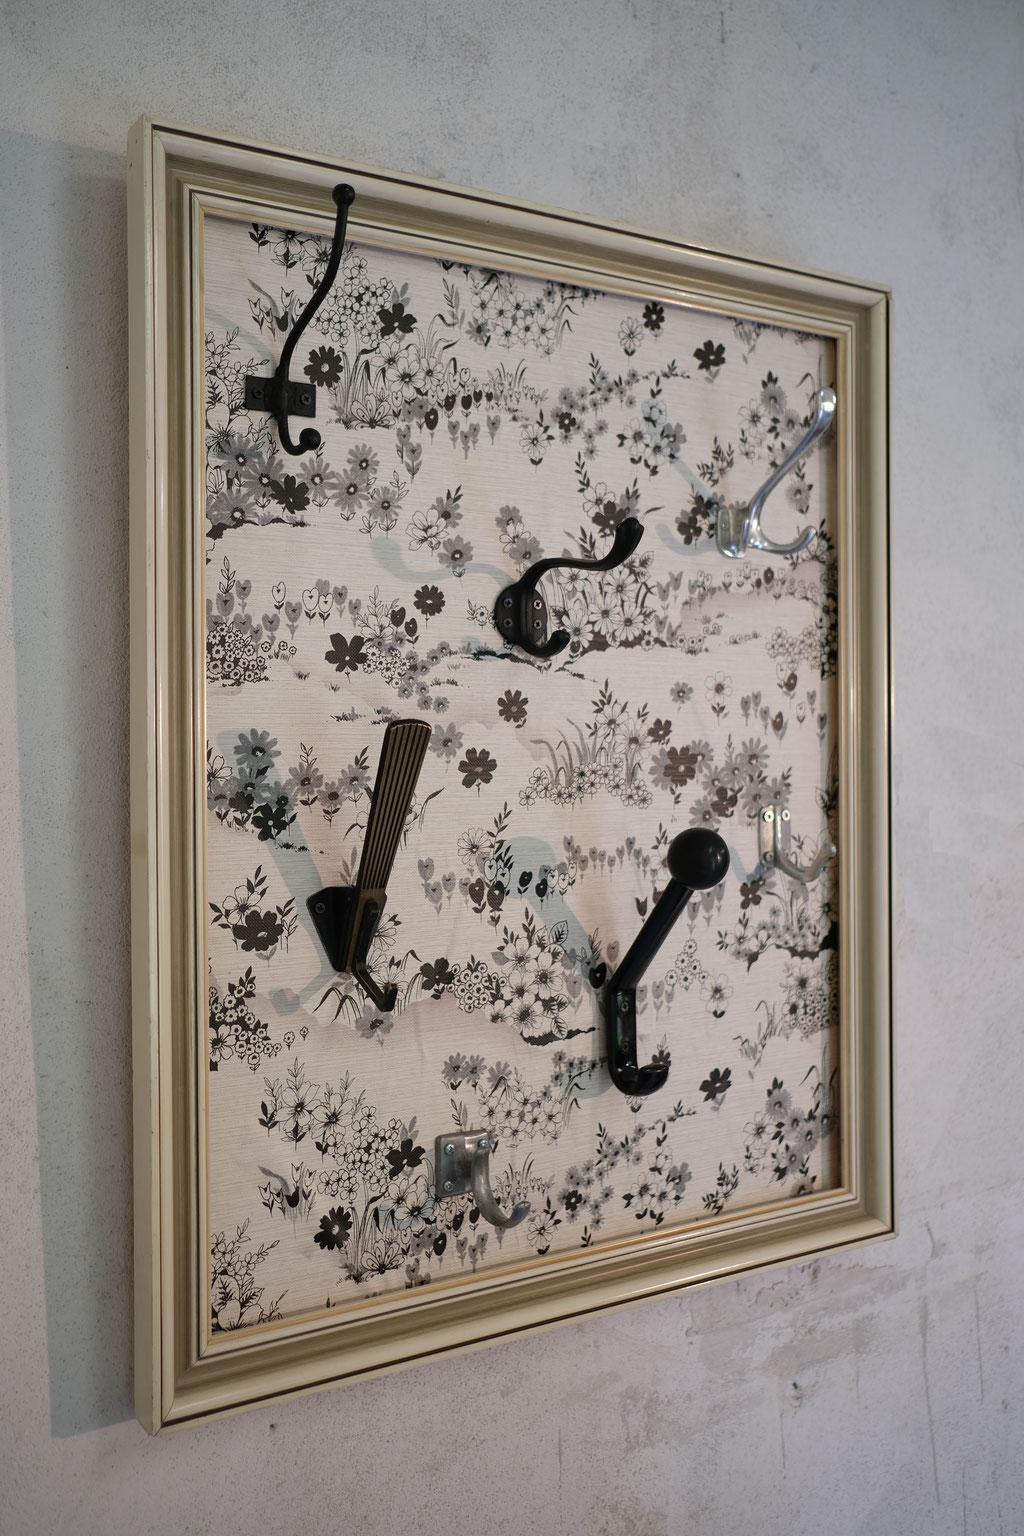 Garderobe Bild, Skulptur, 50er, Wolfgang Wallner, Hall in Tirol